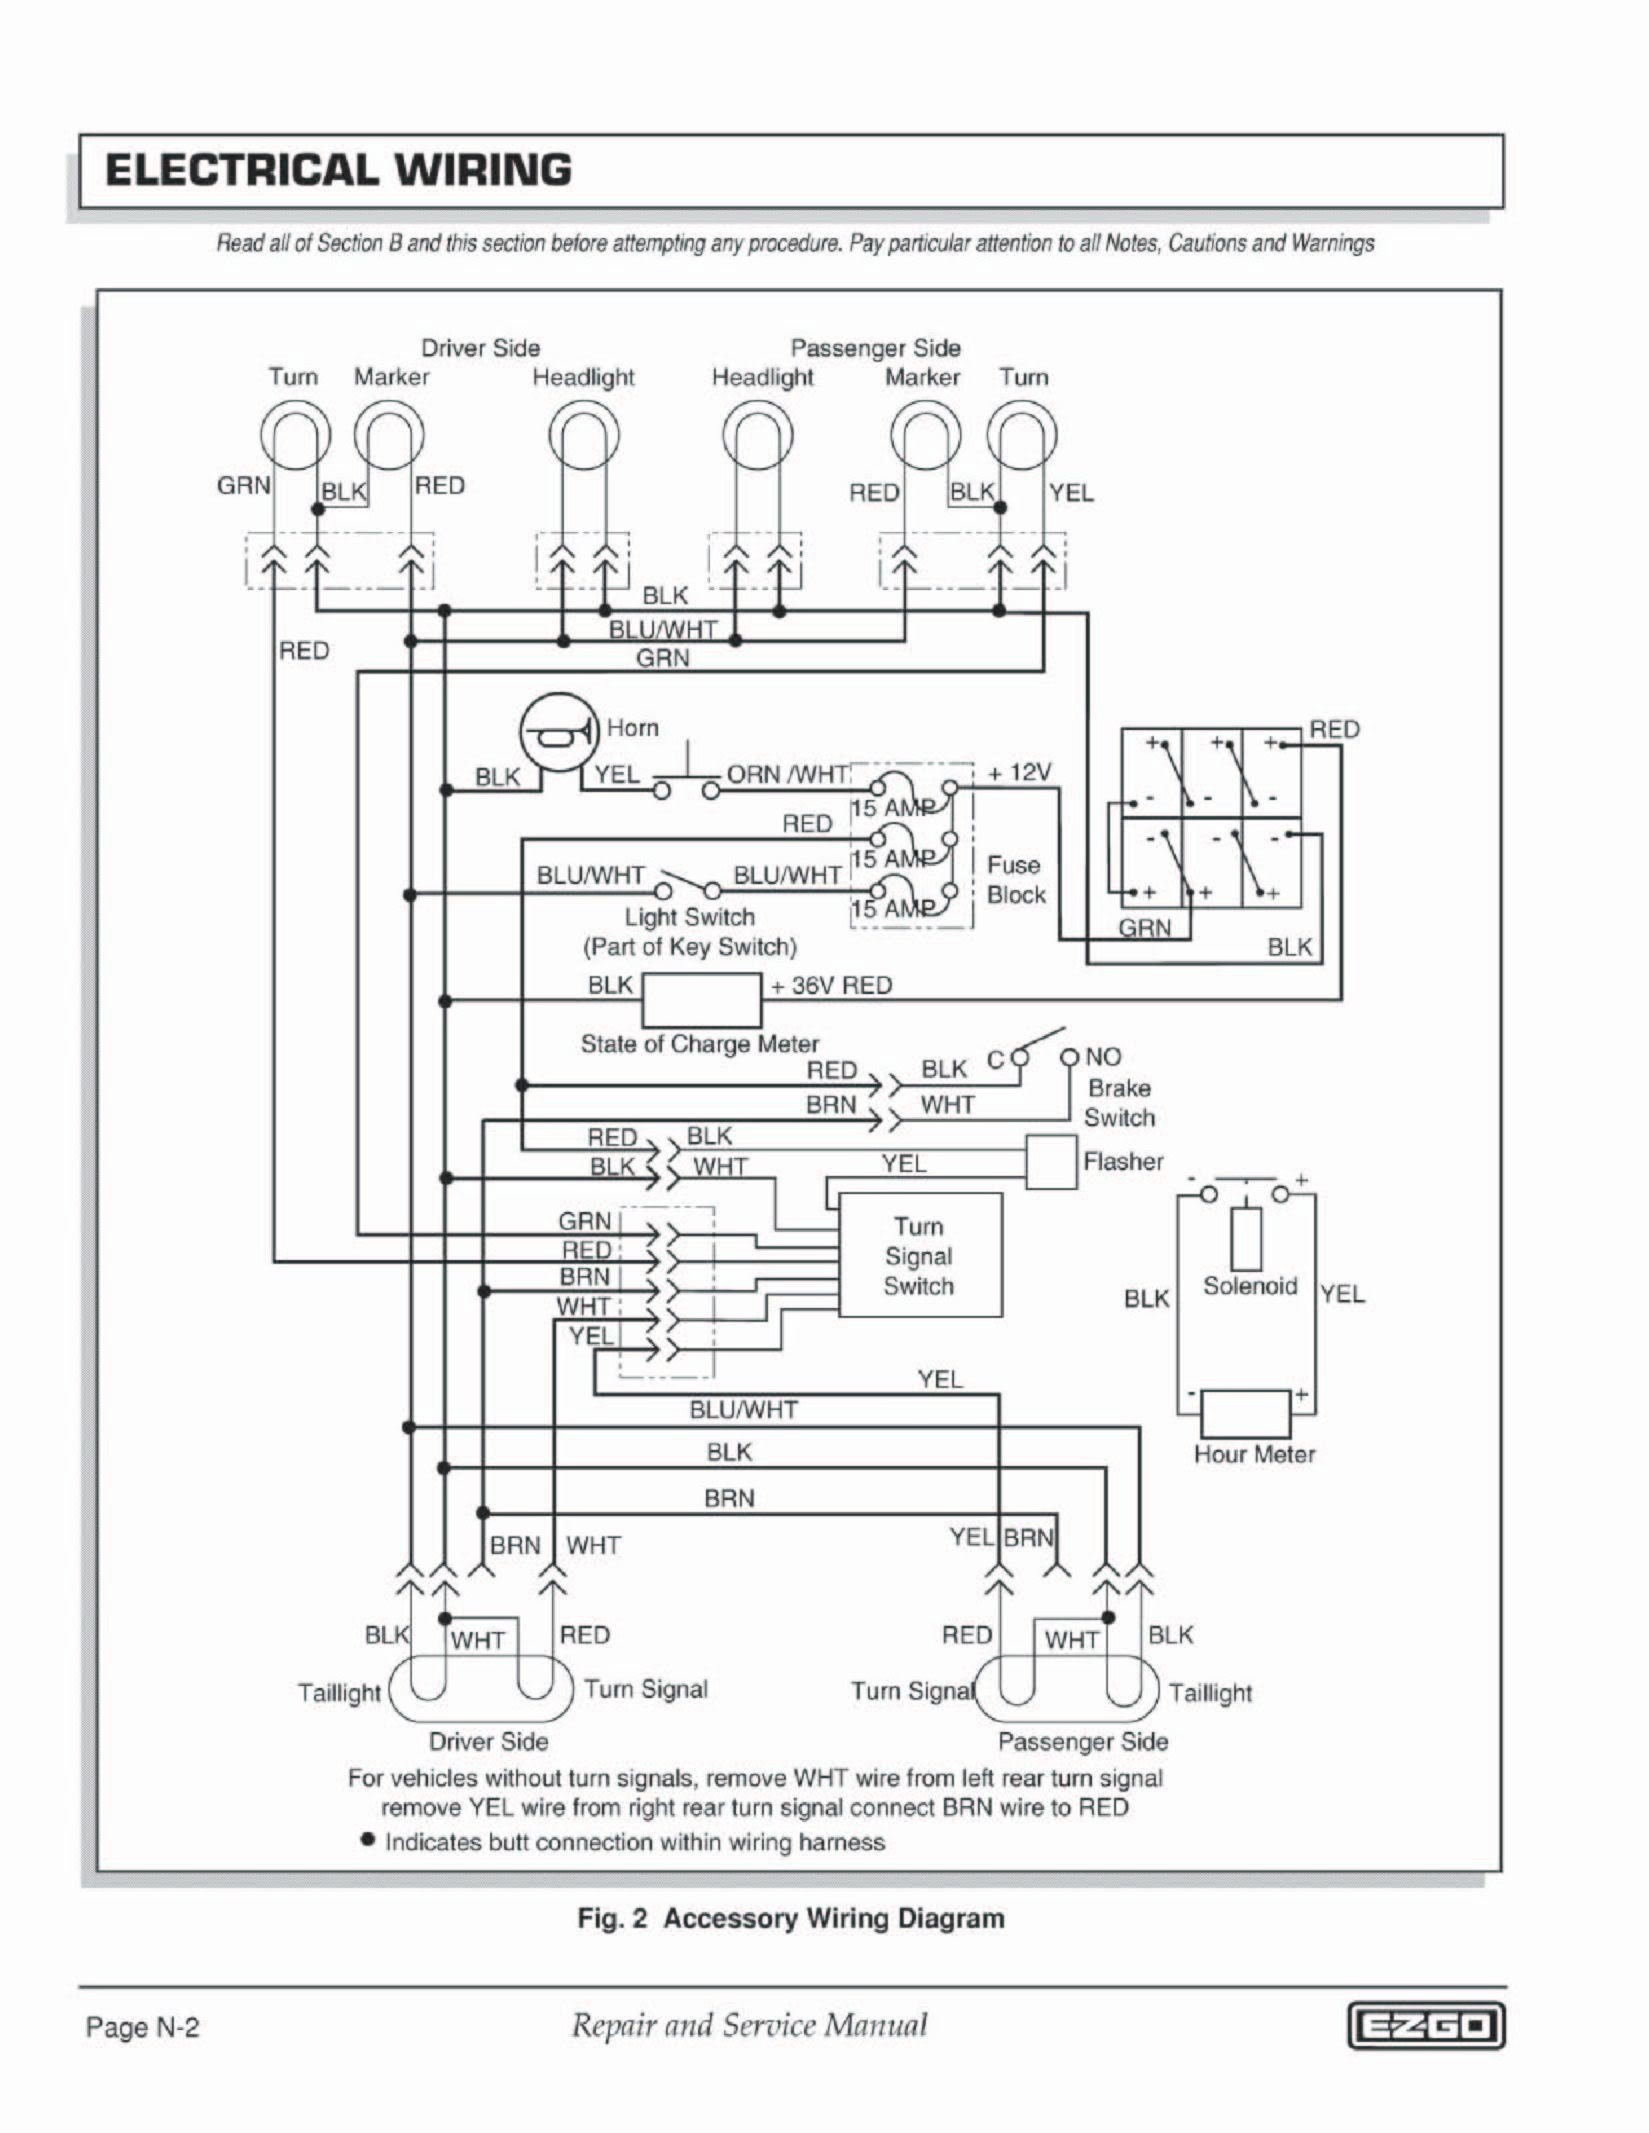 1989 ezgo marathon gas wiring diagram opel vectra b radio golf cart schematic 1988 worksheet and u2022 club car ds